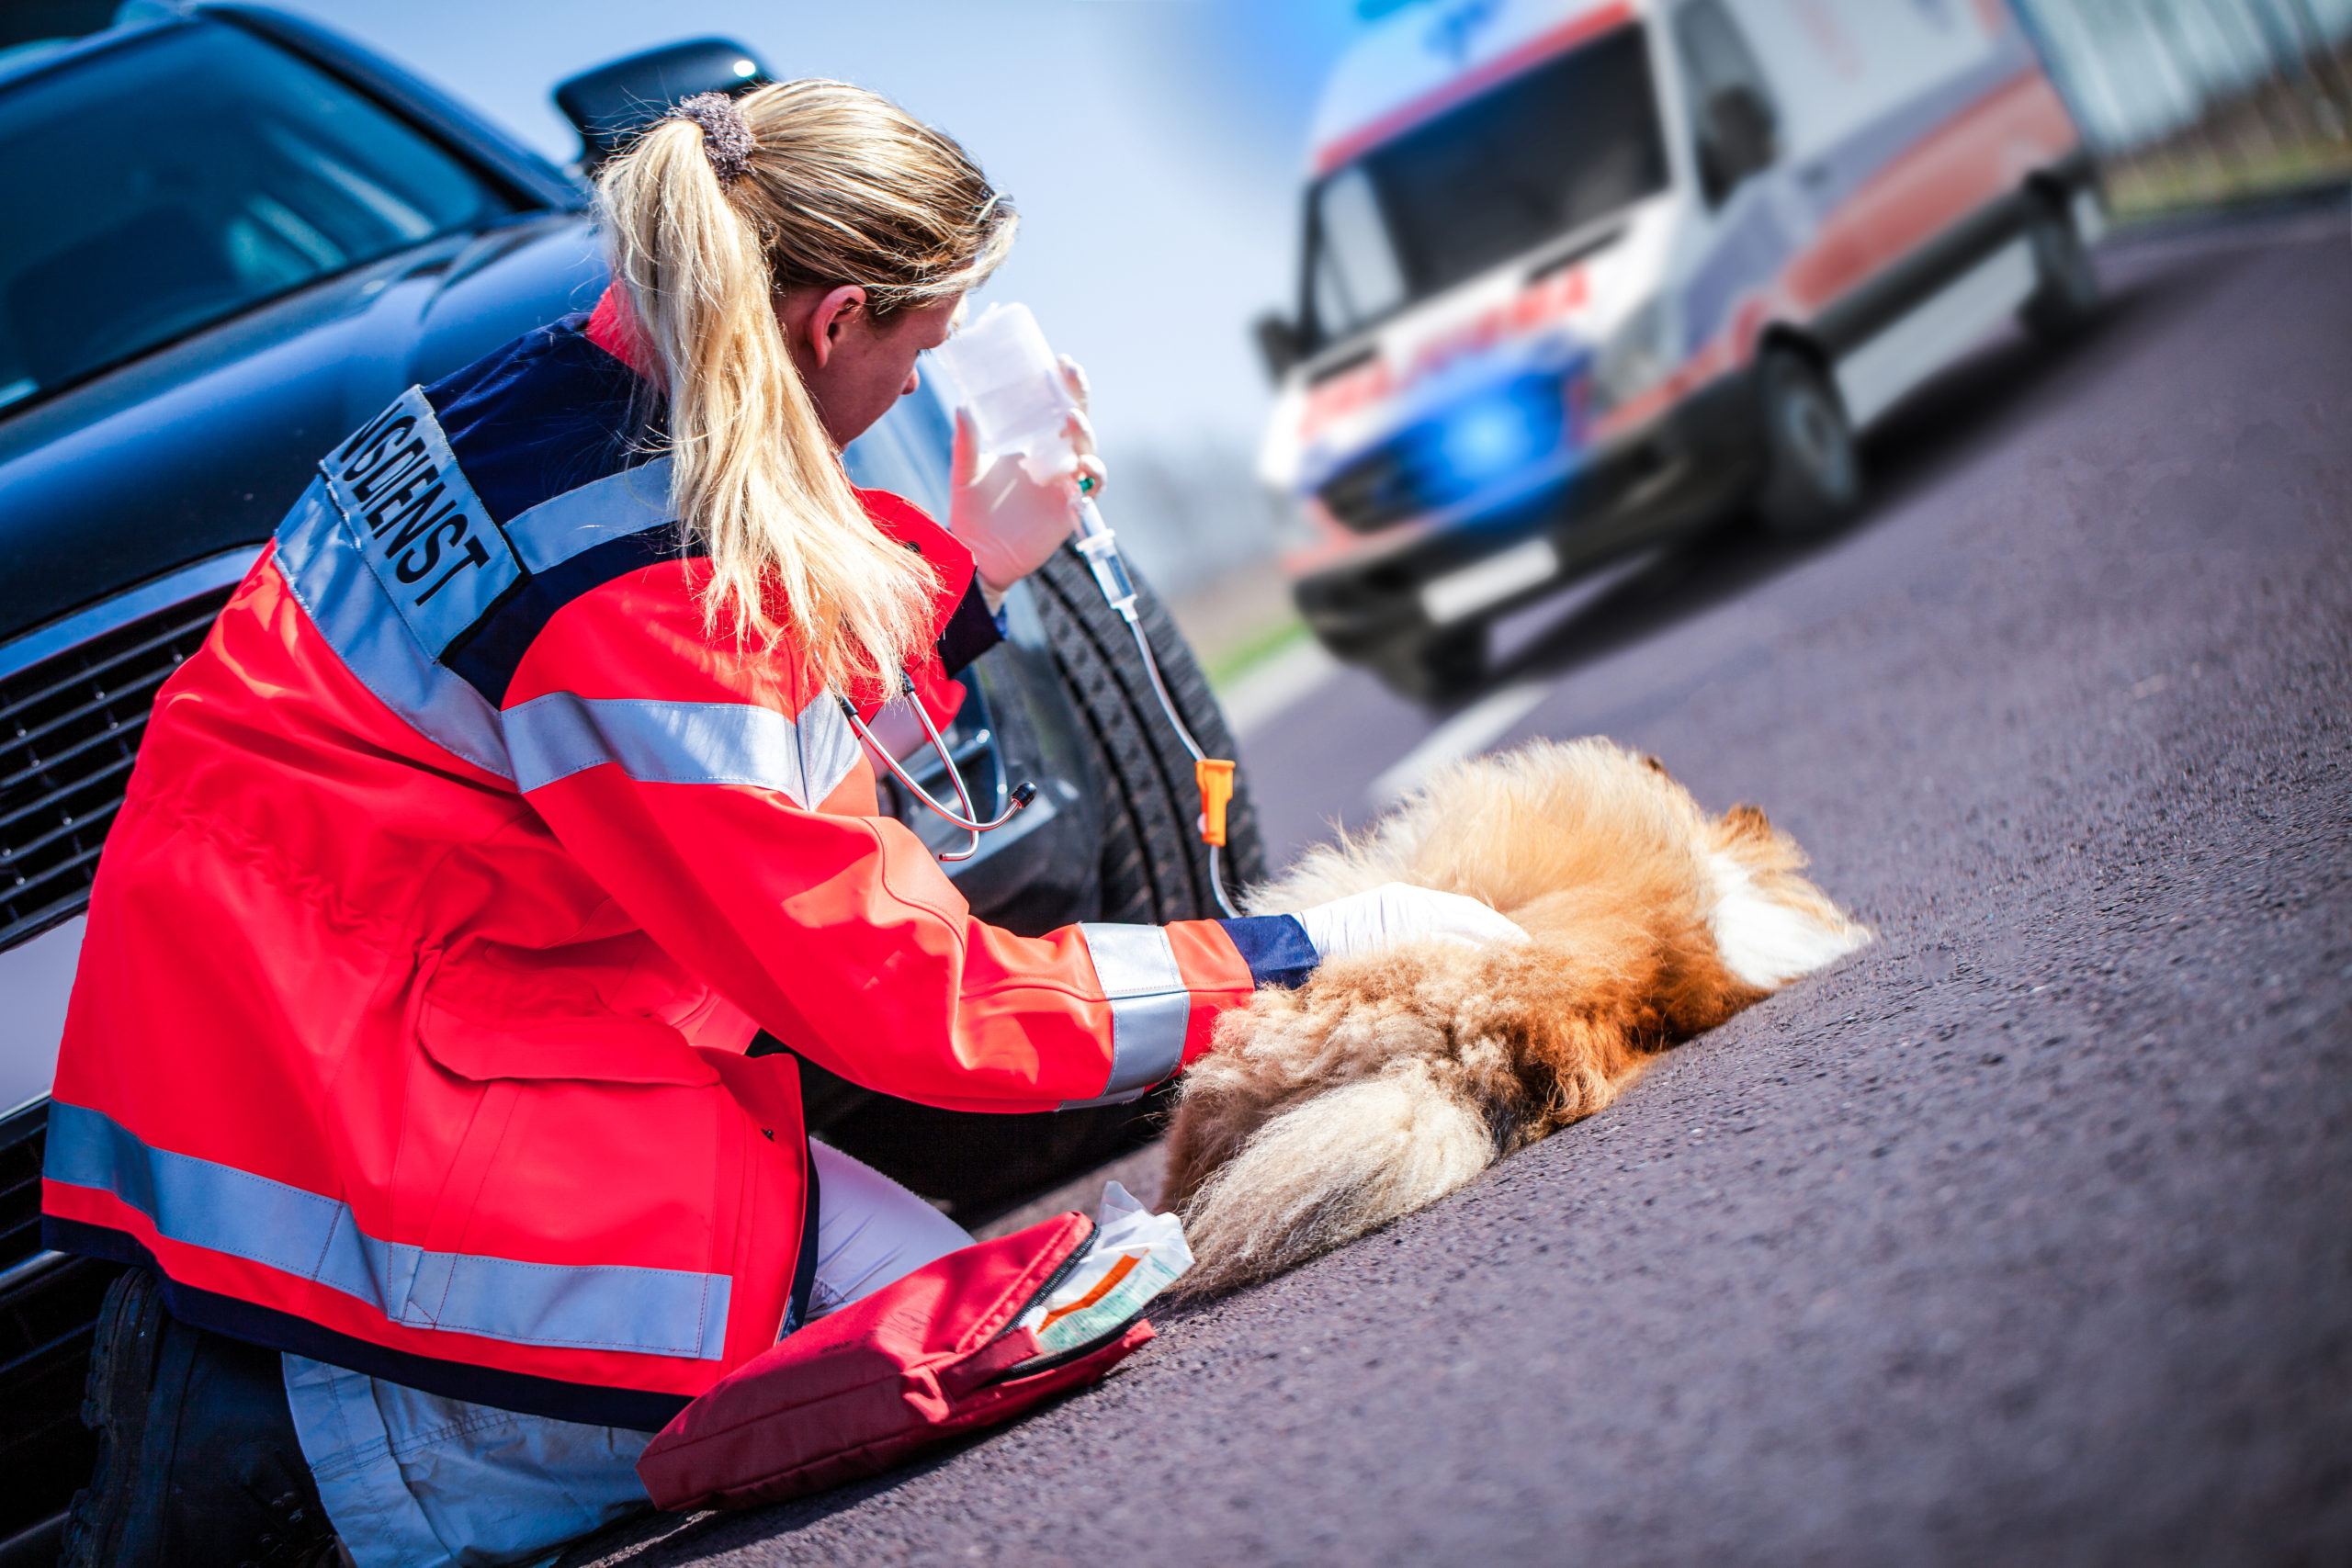 Animal medic treats an injured dog (Shutterstock/Nehris)